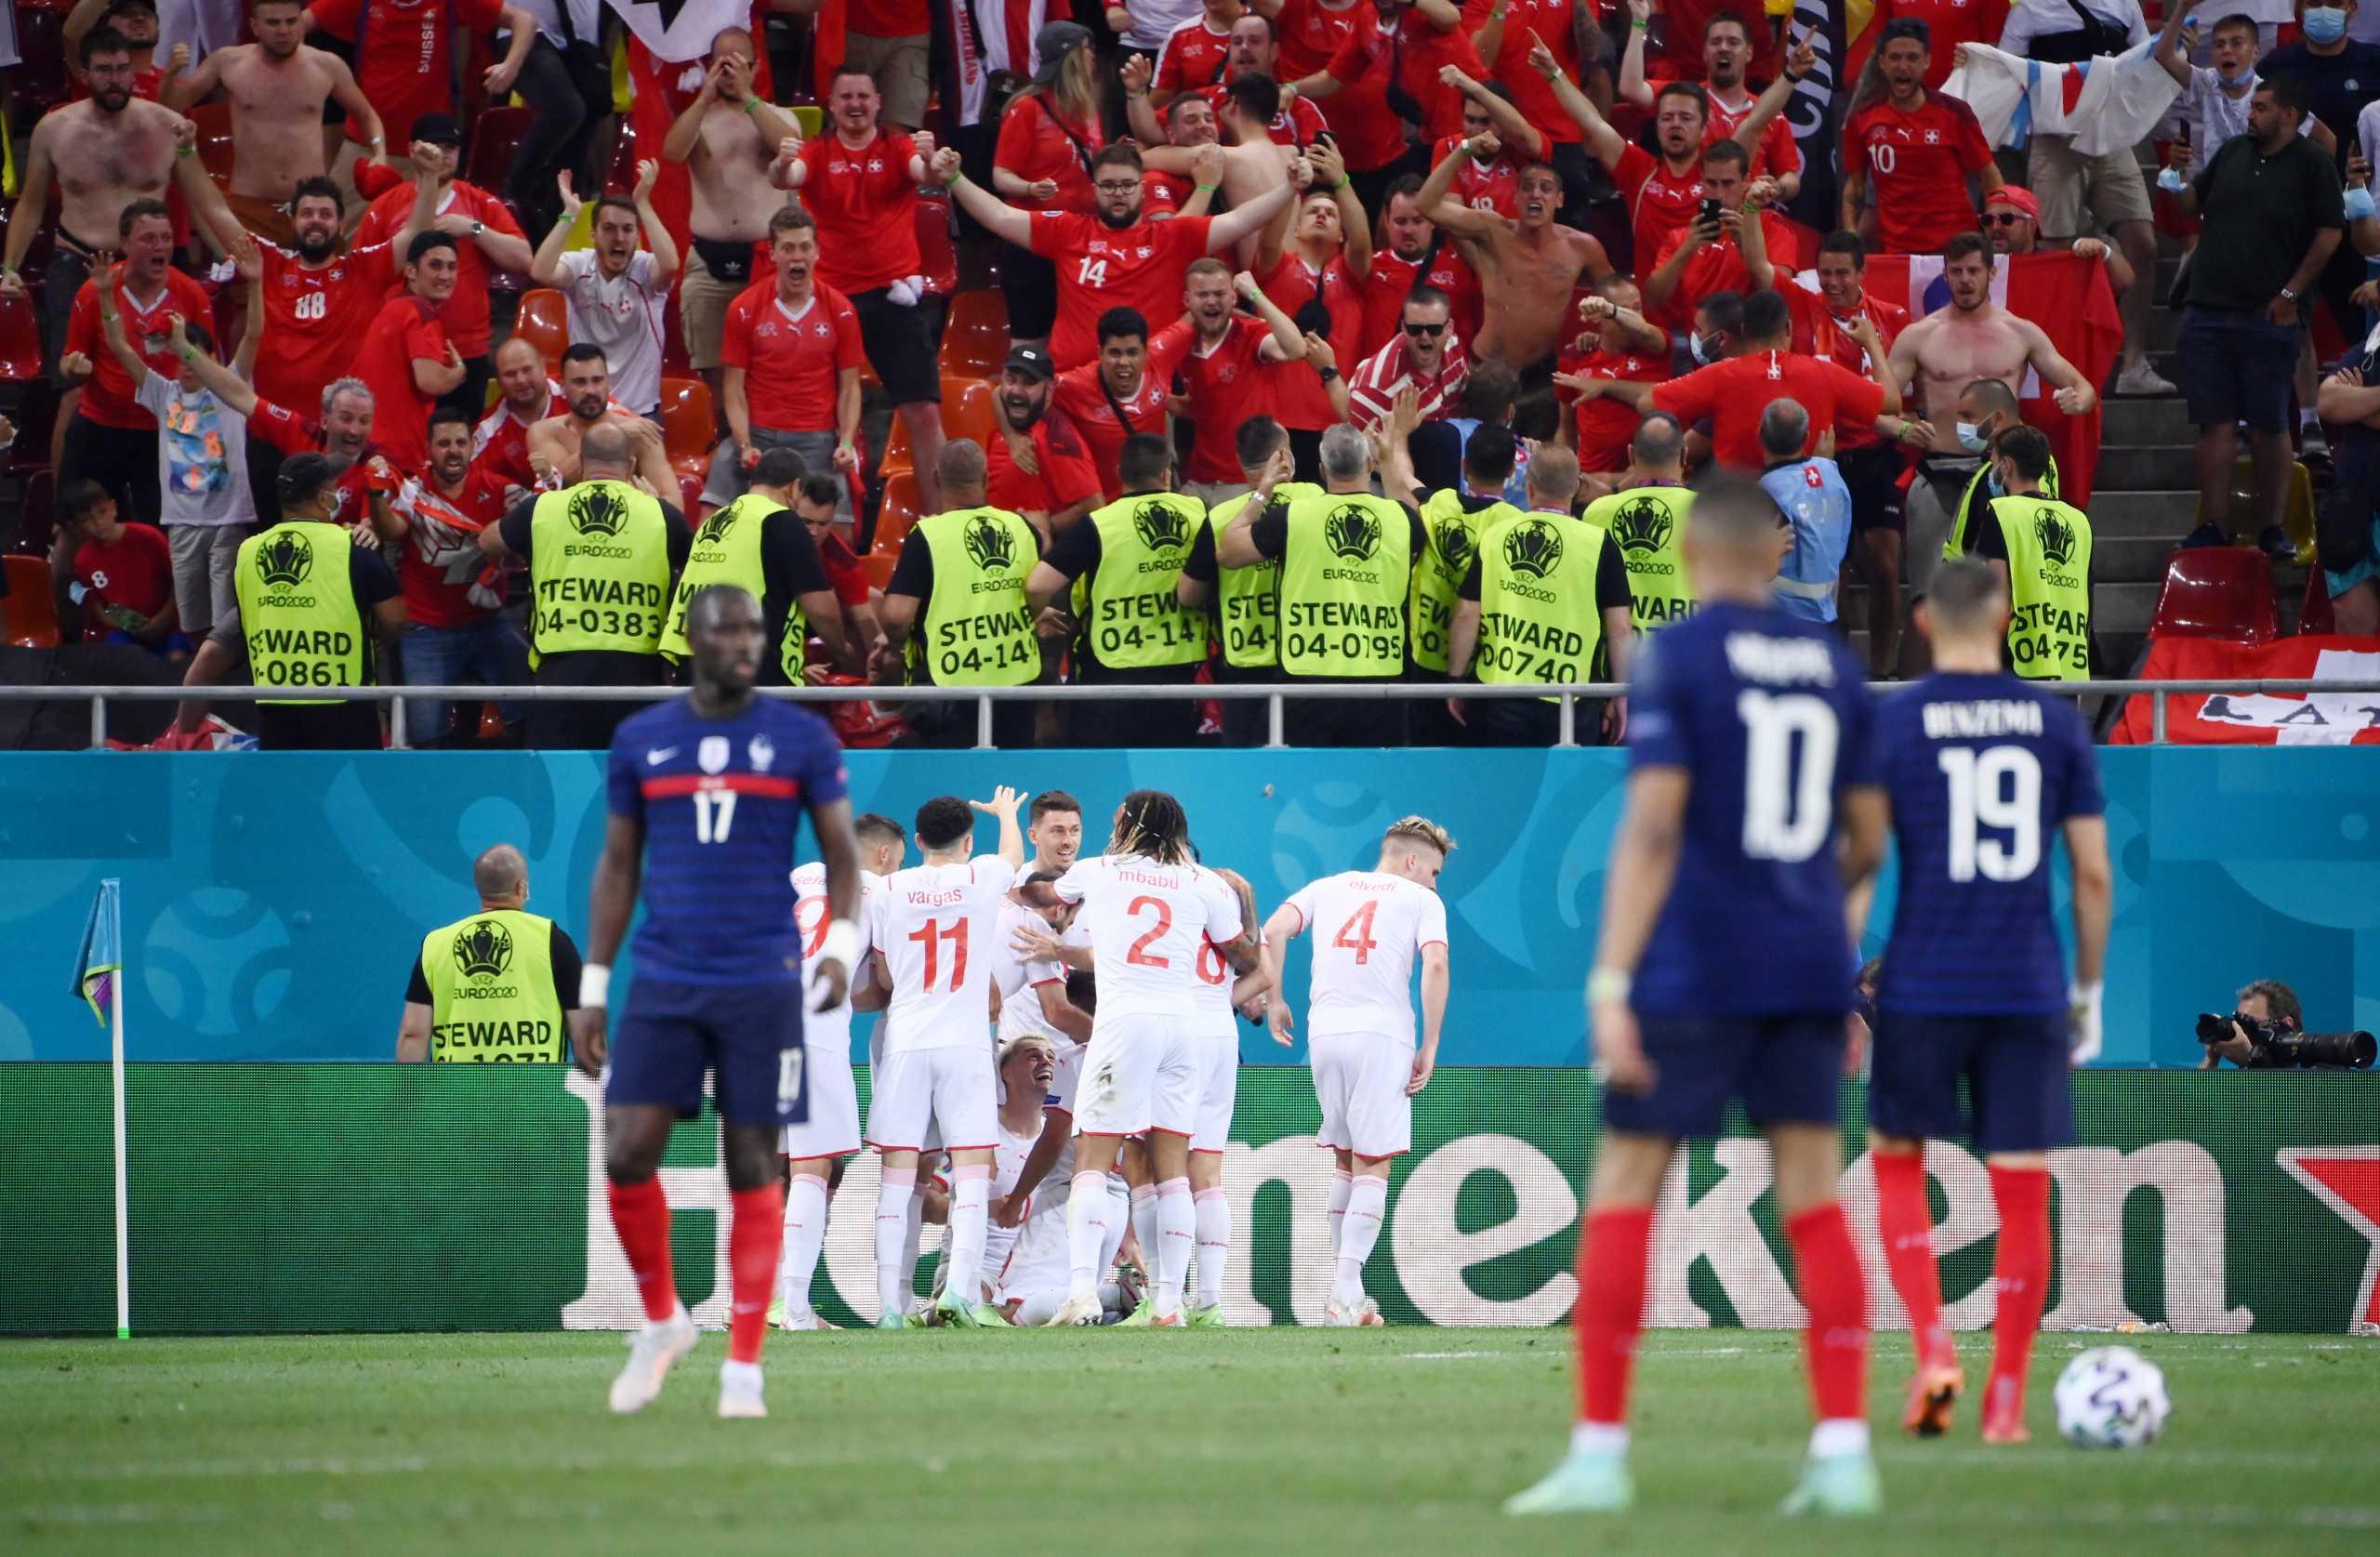 Euro 2020, Γαλλία – Ελβετία 3-3: «Βόμβα» και αποκλεισμός για την παγκόσμια πρωταθλήτρια στα πέναλτι (5-4)